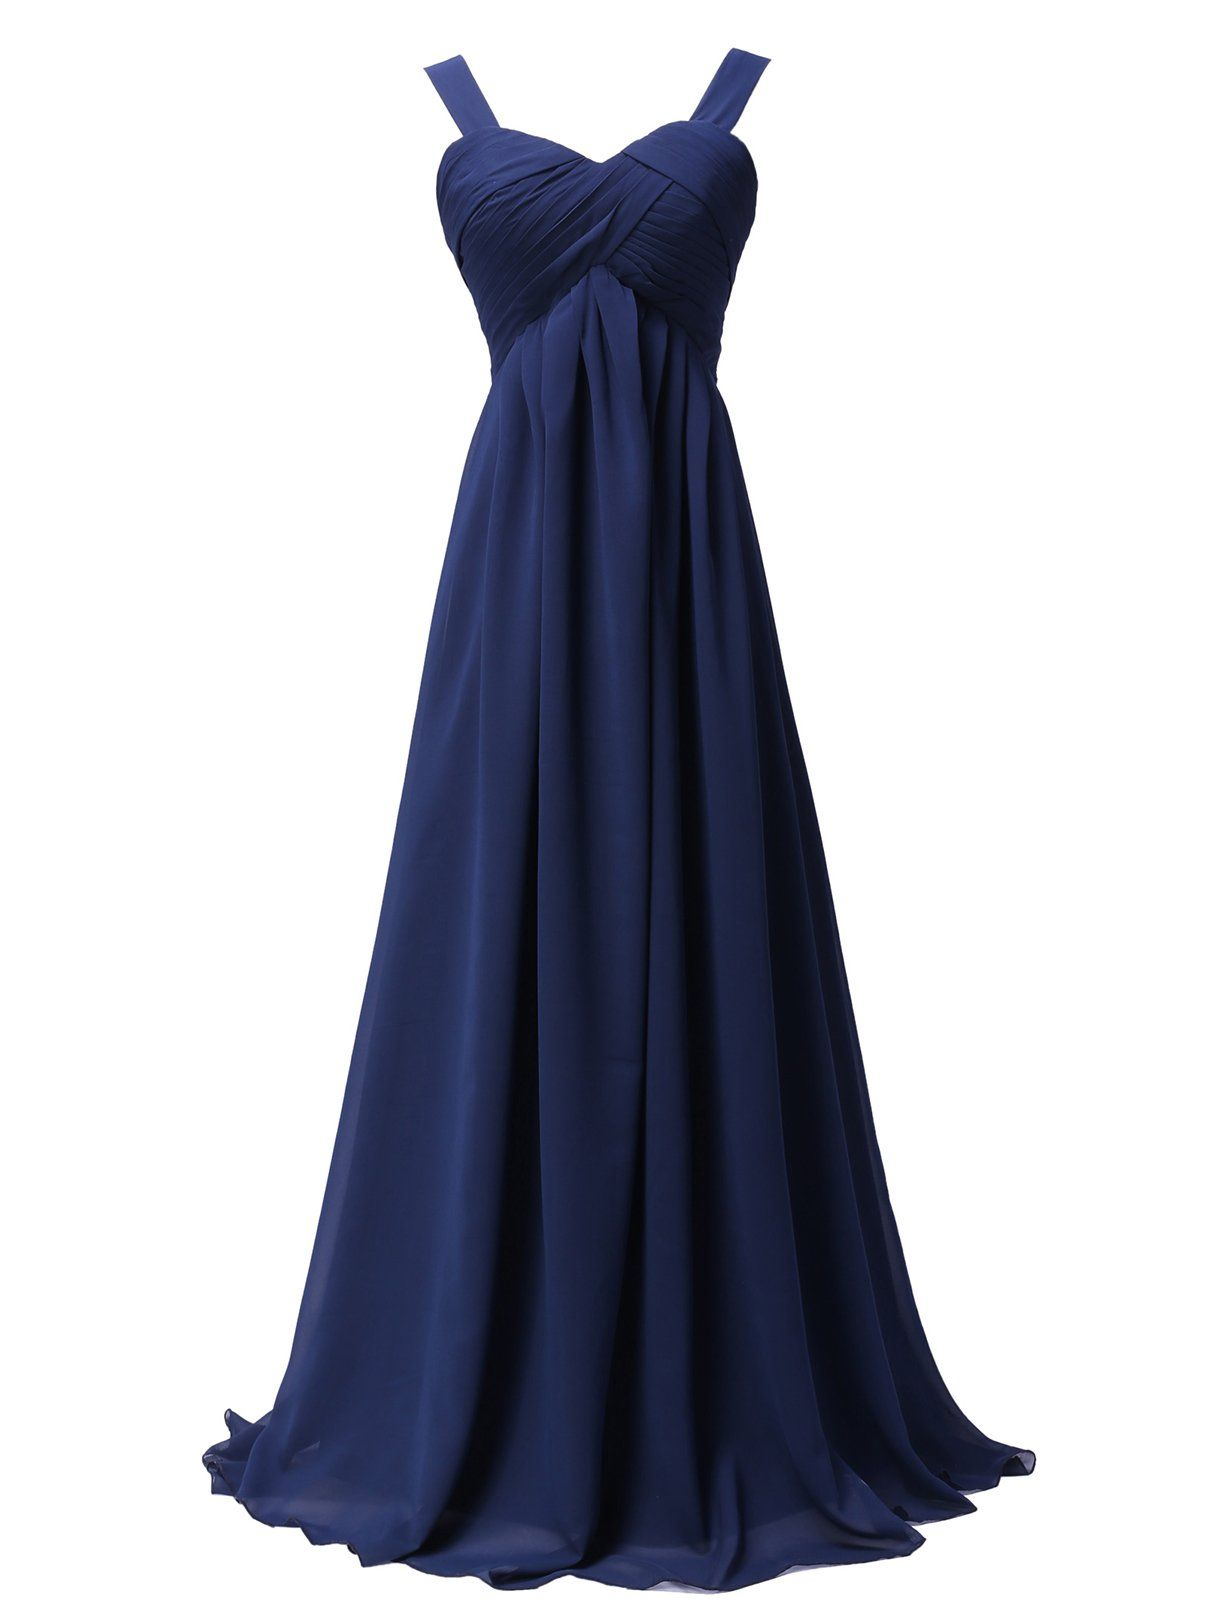 Empire Waist Chiffon Ball Prom Dresses Lace Up Back (Multi-Colored ...